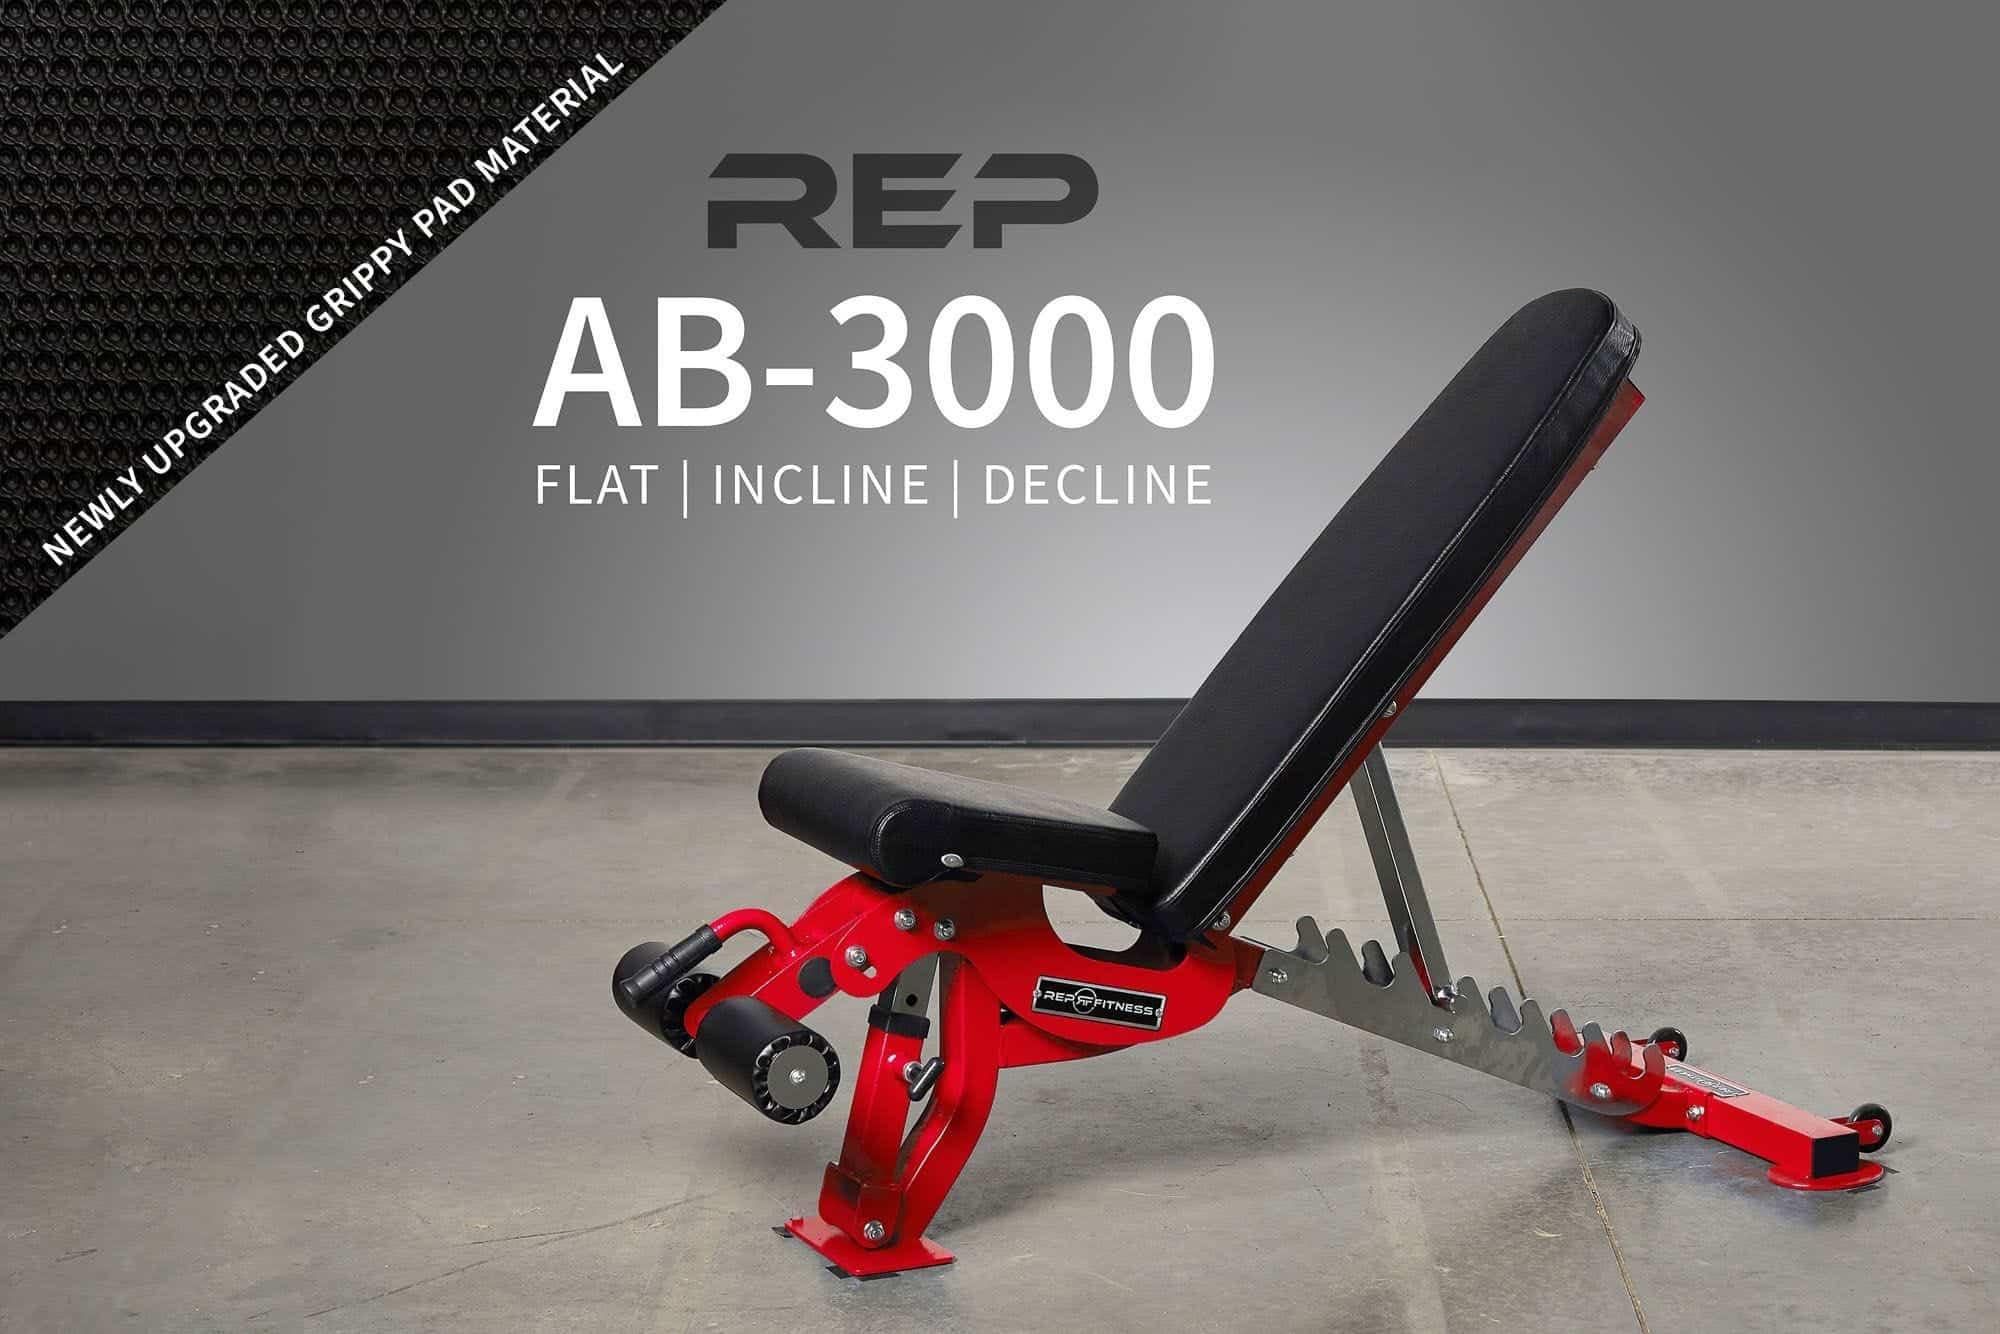 AB-3000 FID ADJUSTABLE BENCH